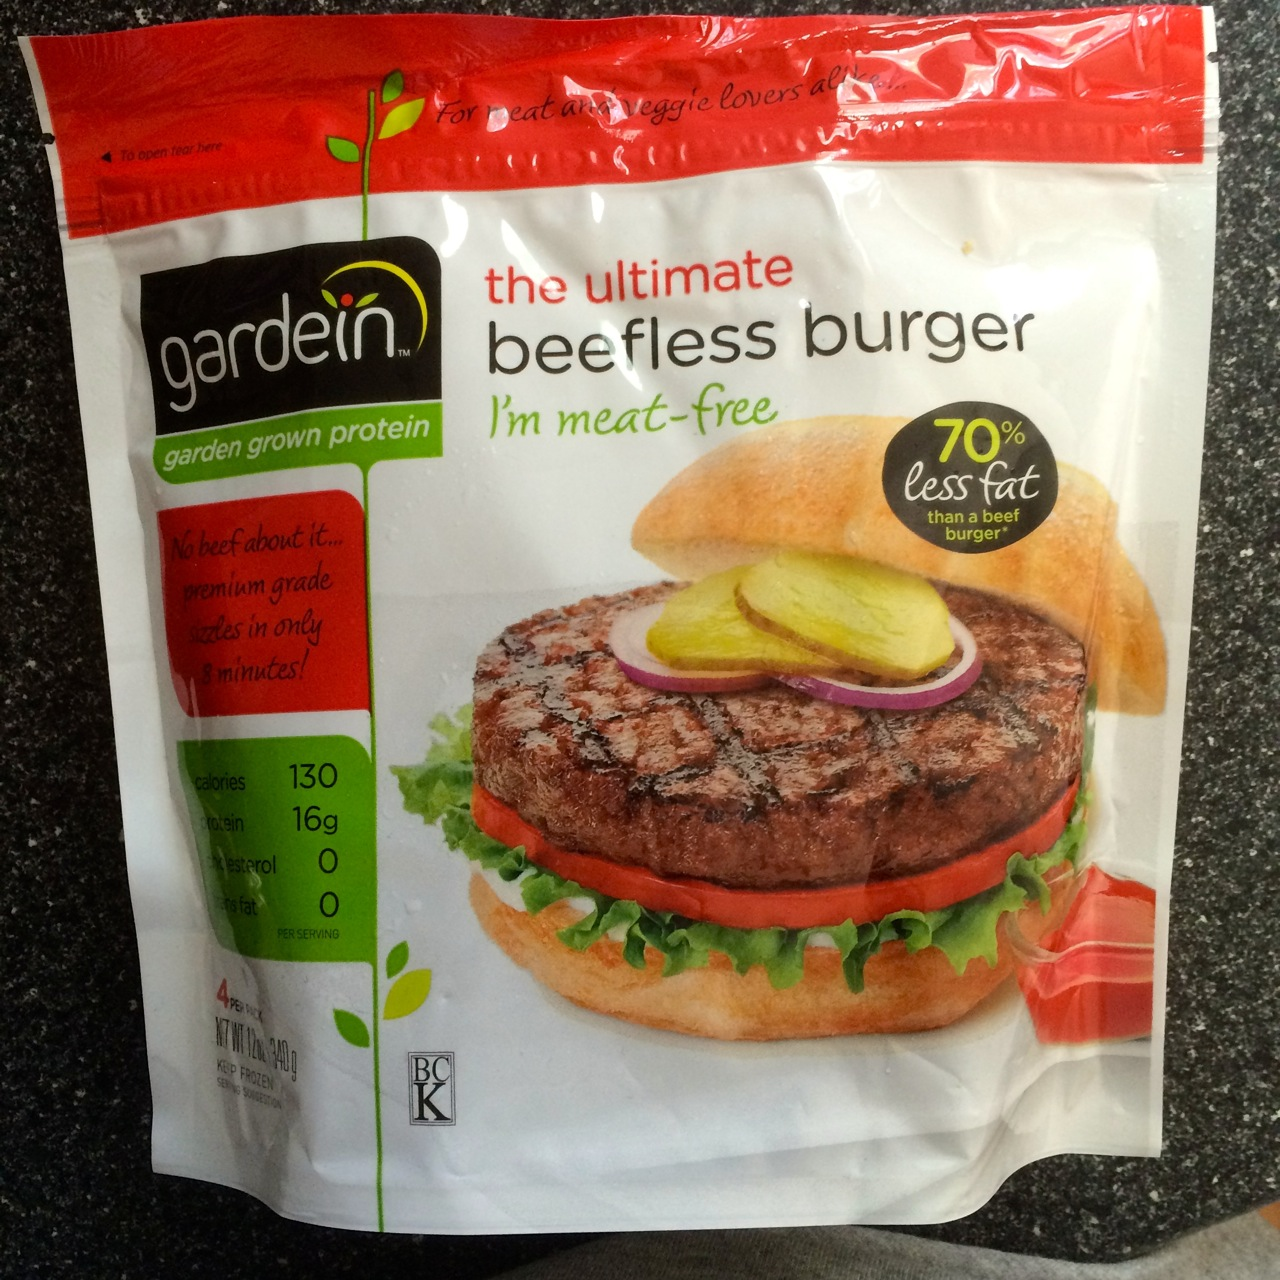 https://i1.wp.com/fatgayvegan.com/wp-content/uploads/2015/06/gardein-the-ultimate-beefless-burger.jpg?fit=1280%2C1280